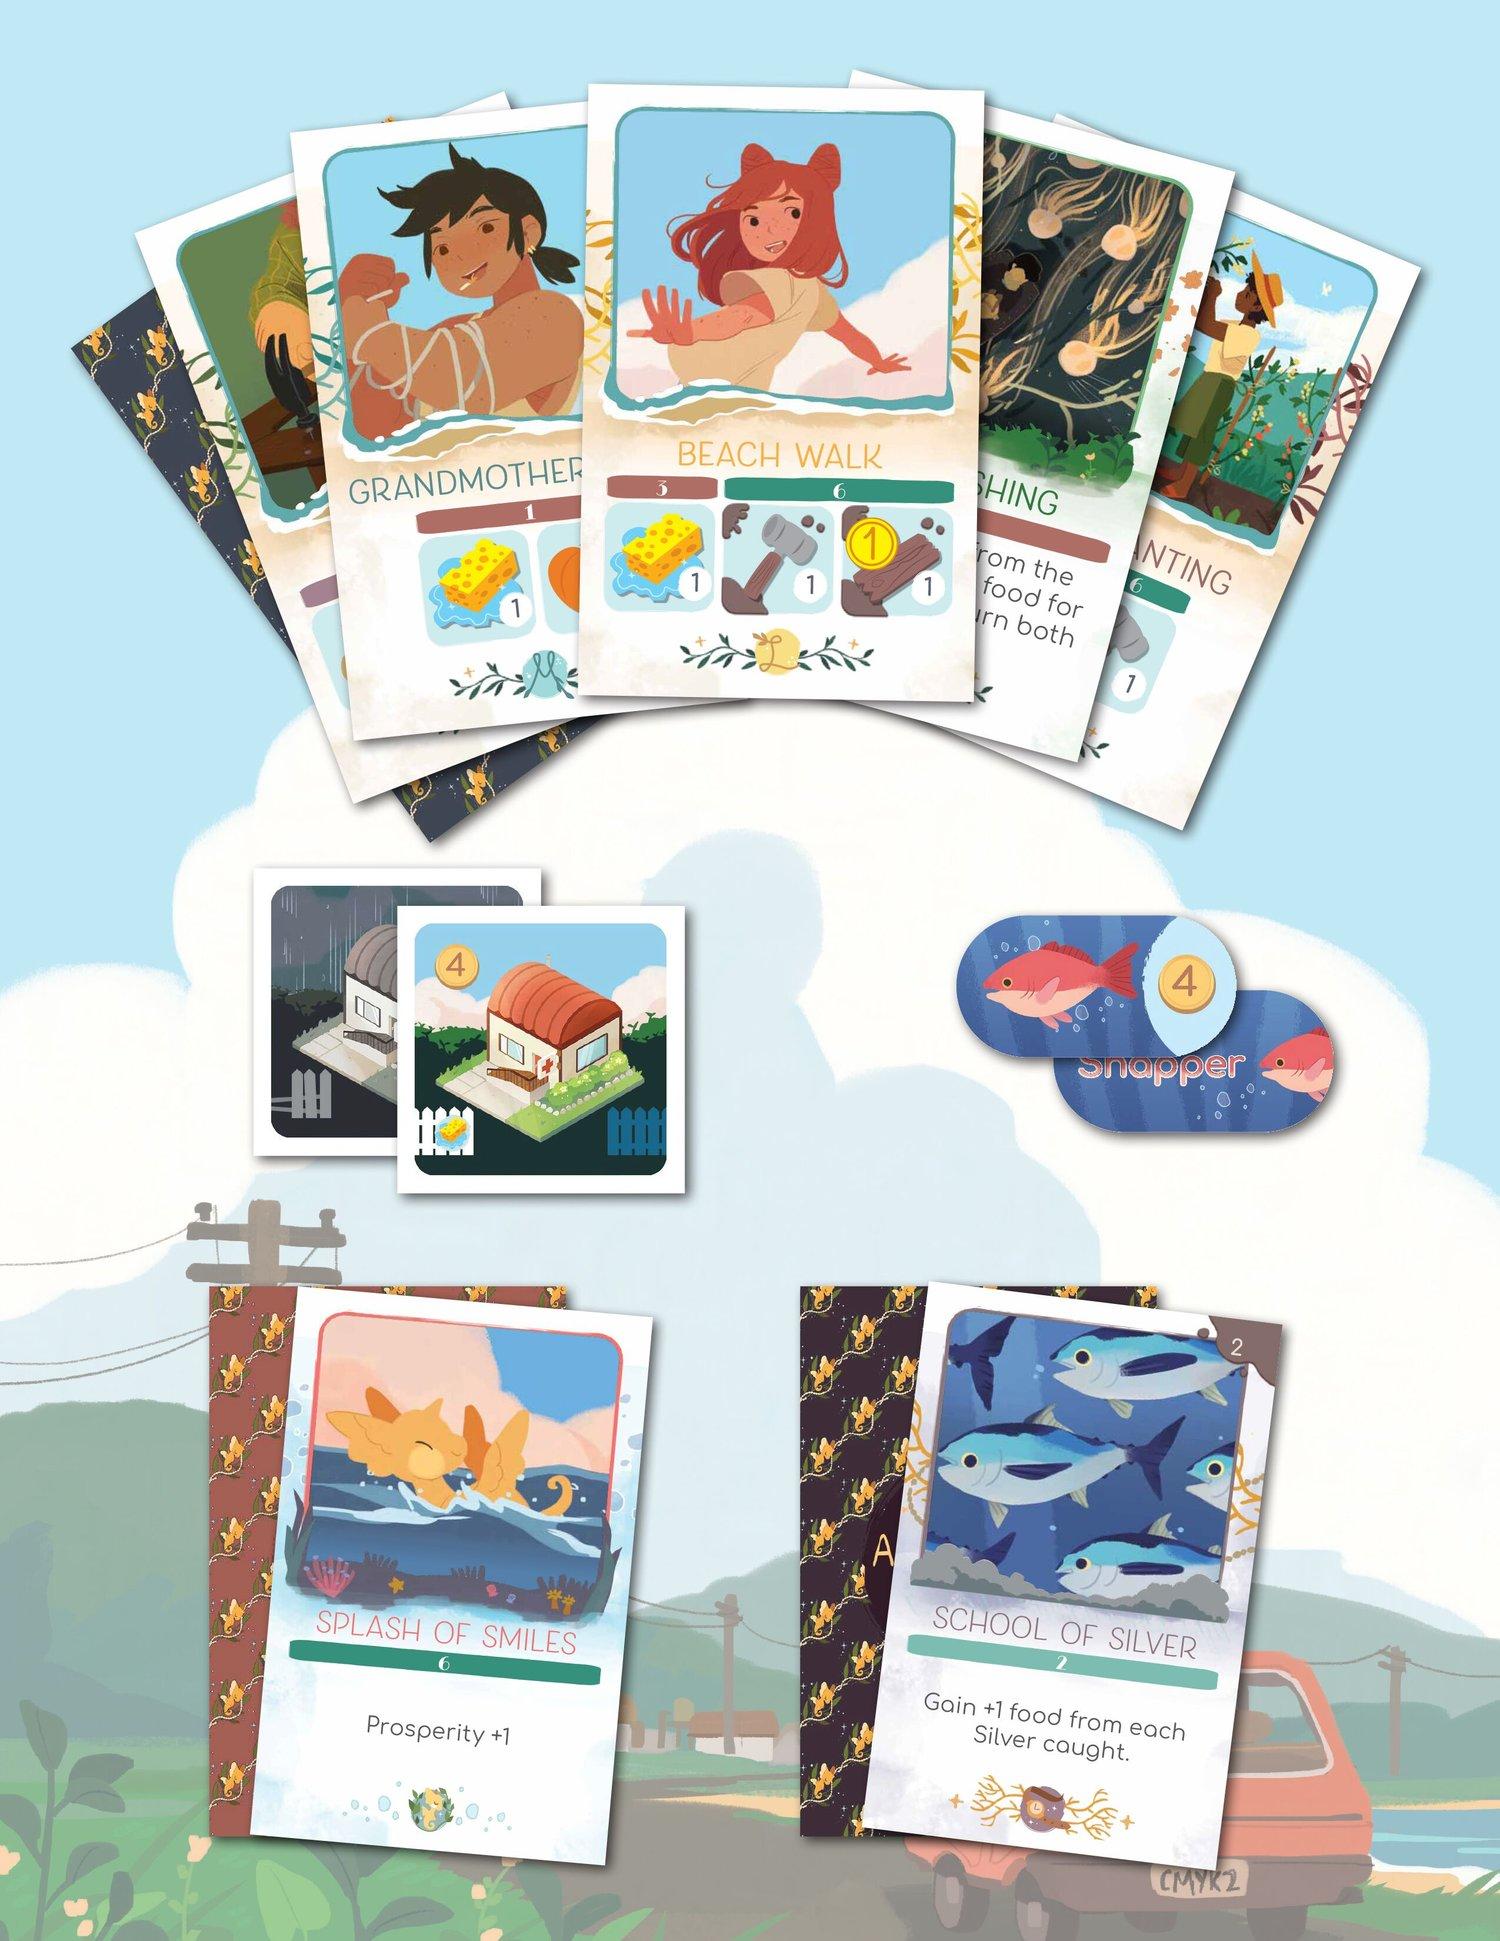 Aquicorn Cove board game from Renegade Game Studios